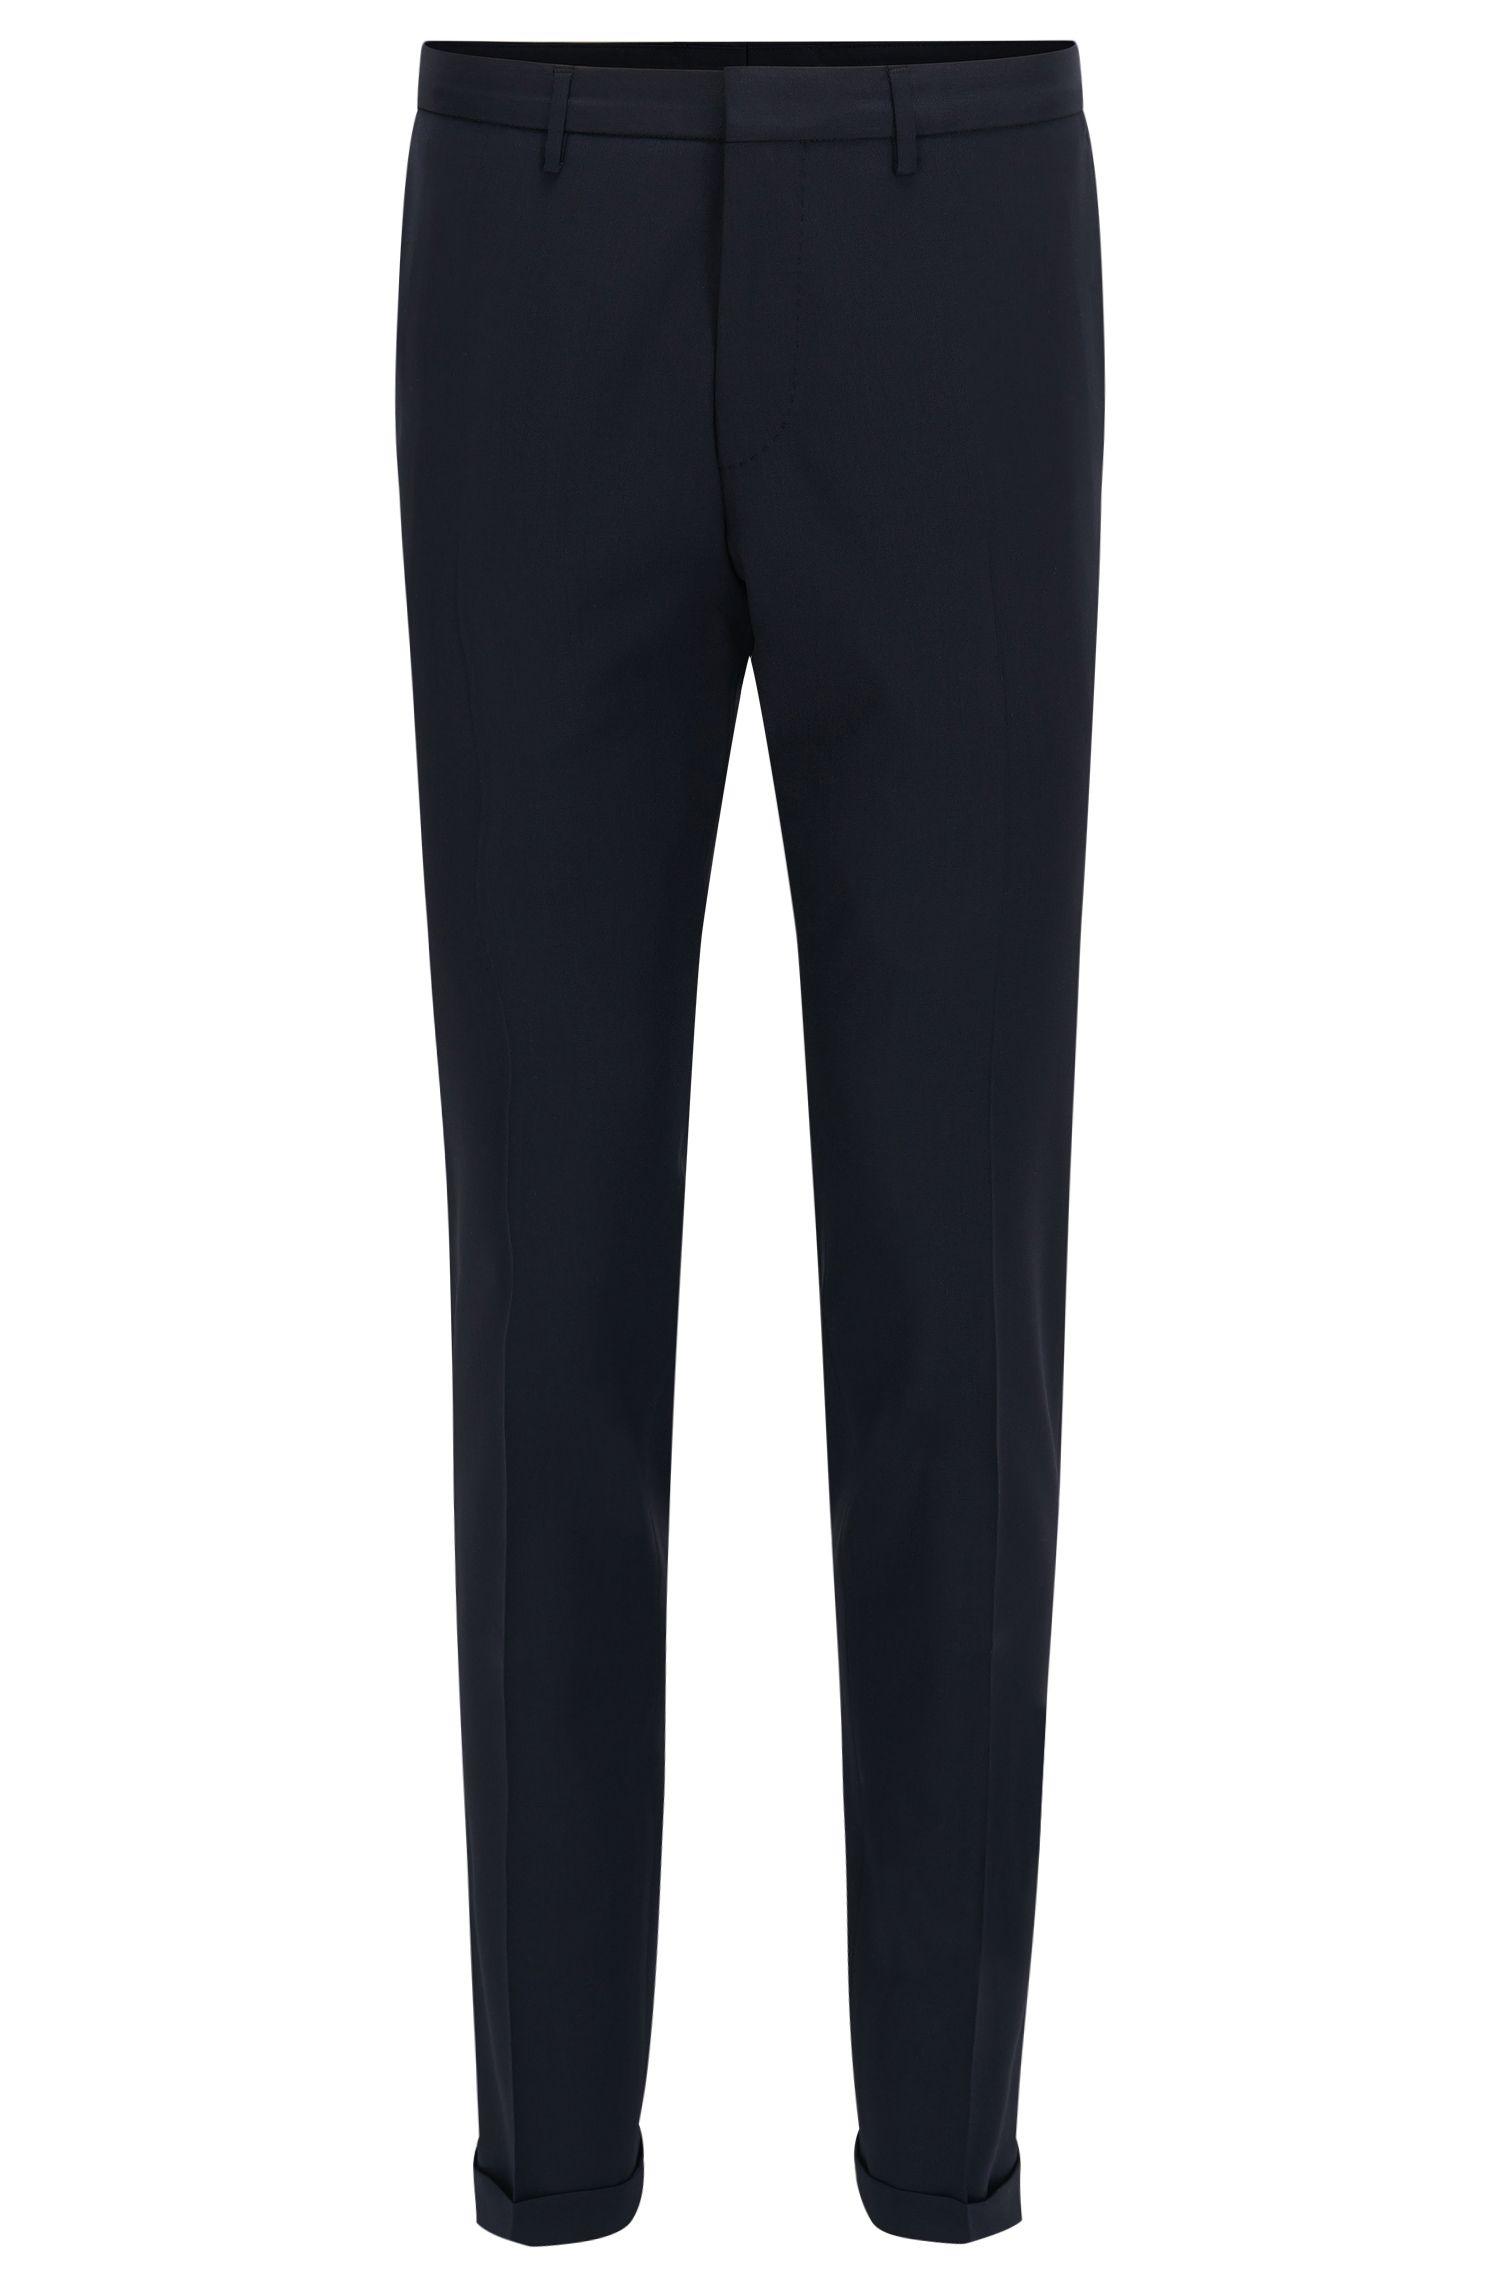 Pantaloni extra slim fit in lana vergine